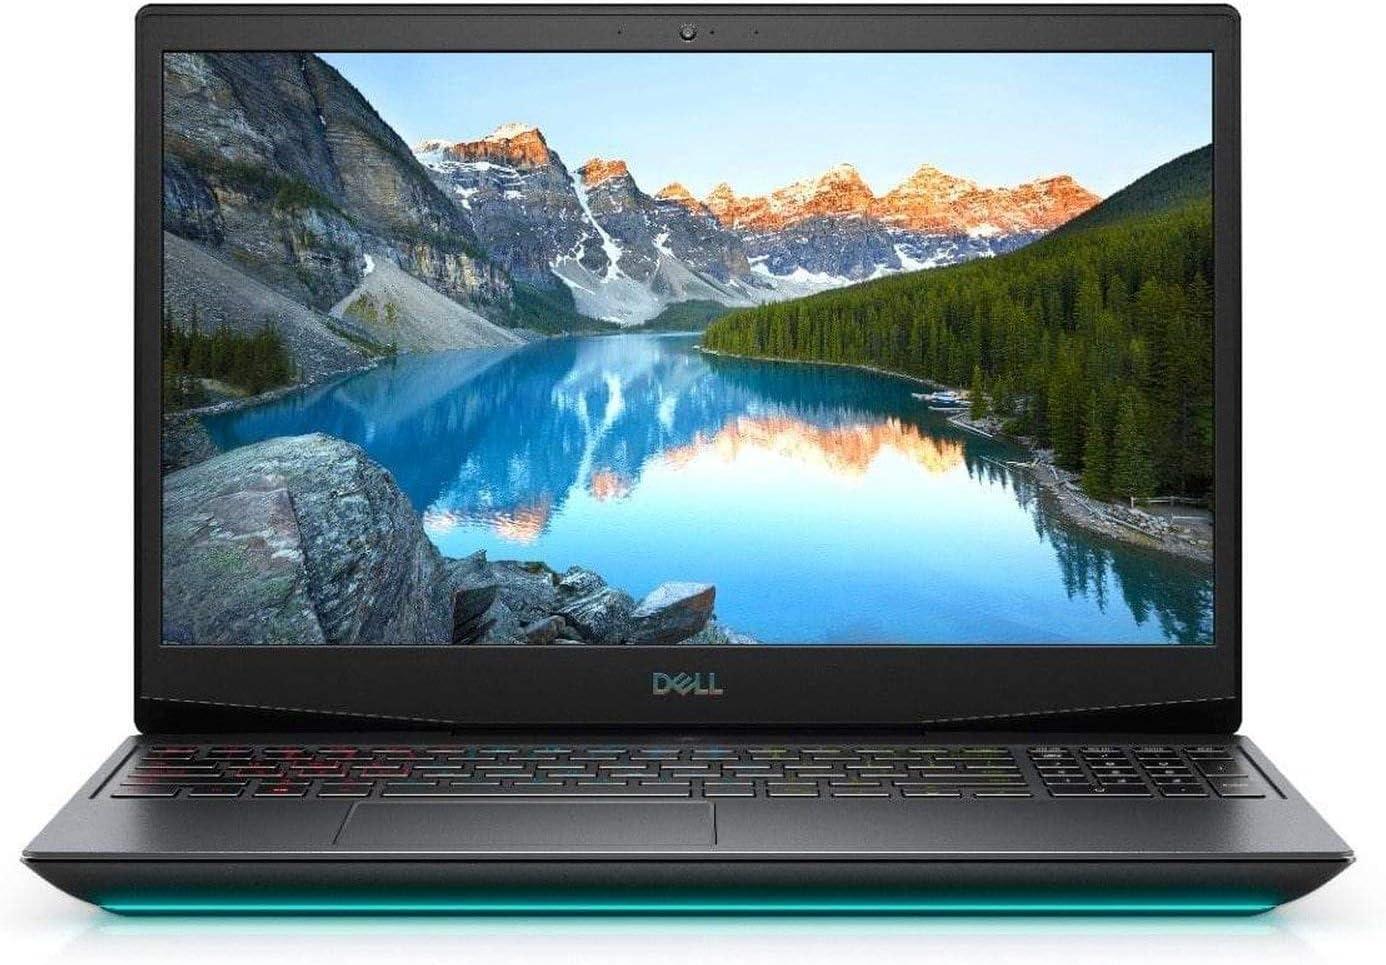 Dell G5 5500 Laptop 15.6 - Intel Core i7 10th Gen - i7-10750H - Six Core 5Ghz - 512GB SSD - 16GB RAM - Nvidia GeForce GTX 1660 Ti - 1920x1080 FHD - Windows 10 Home